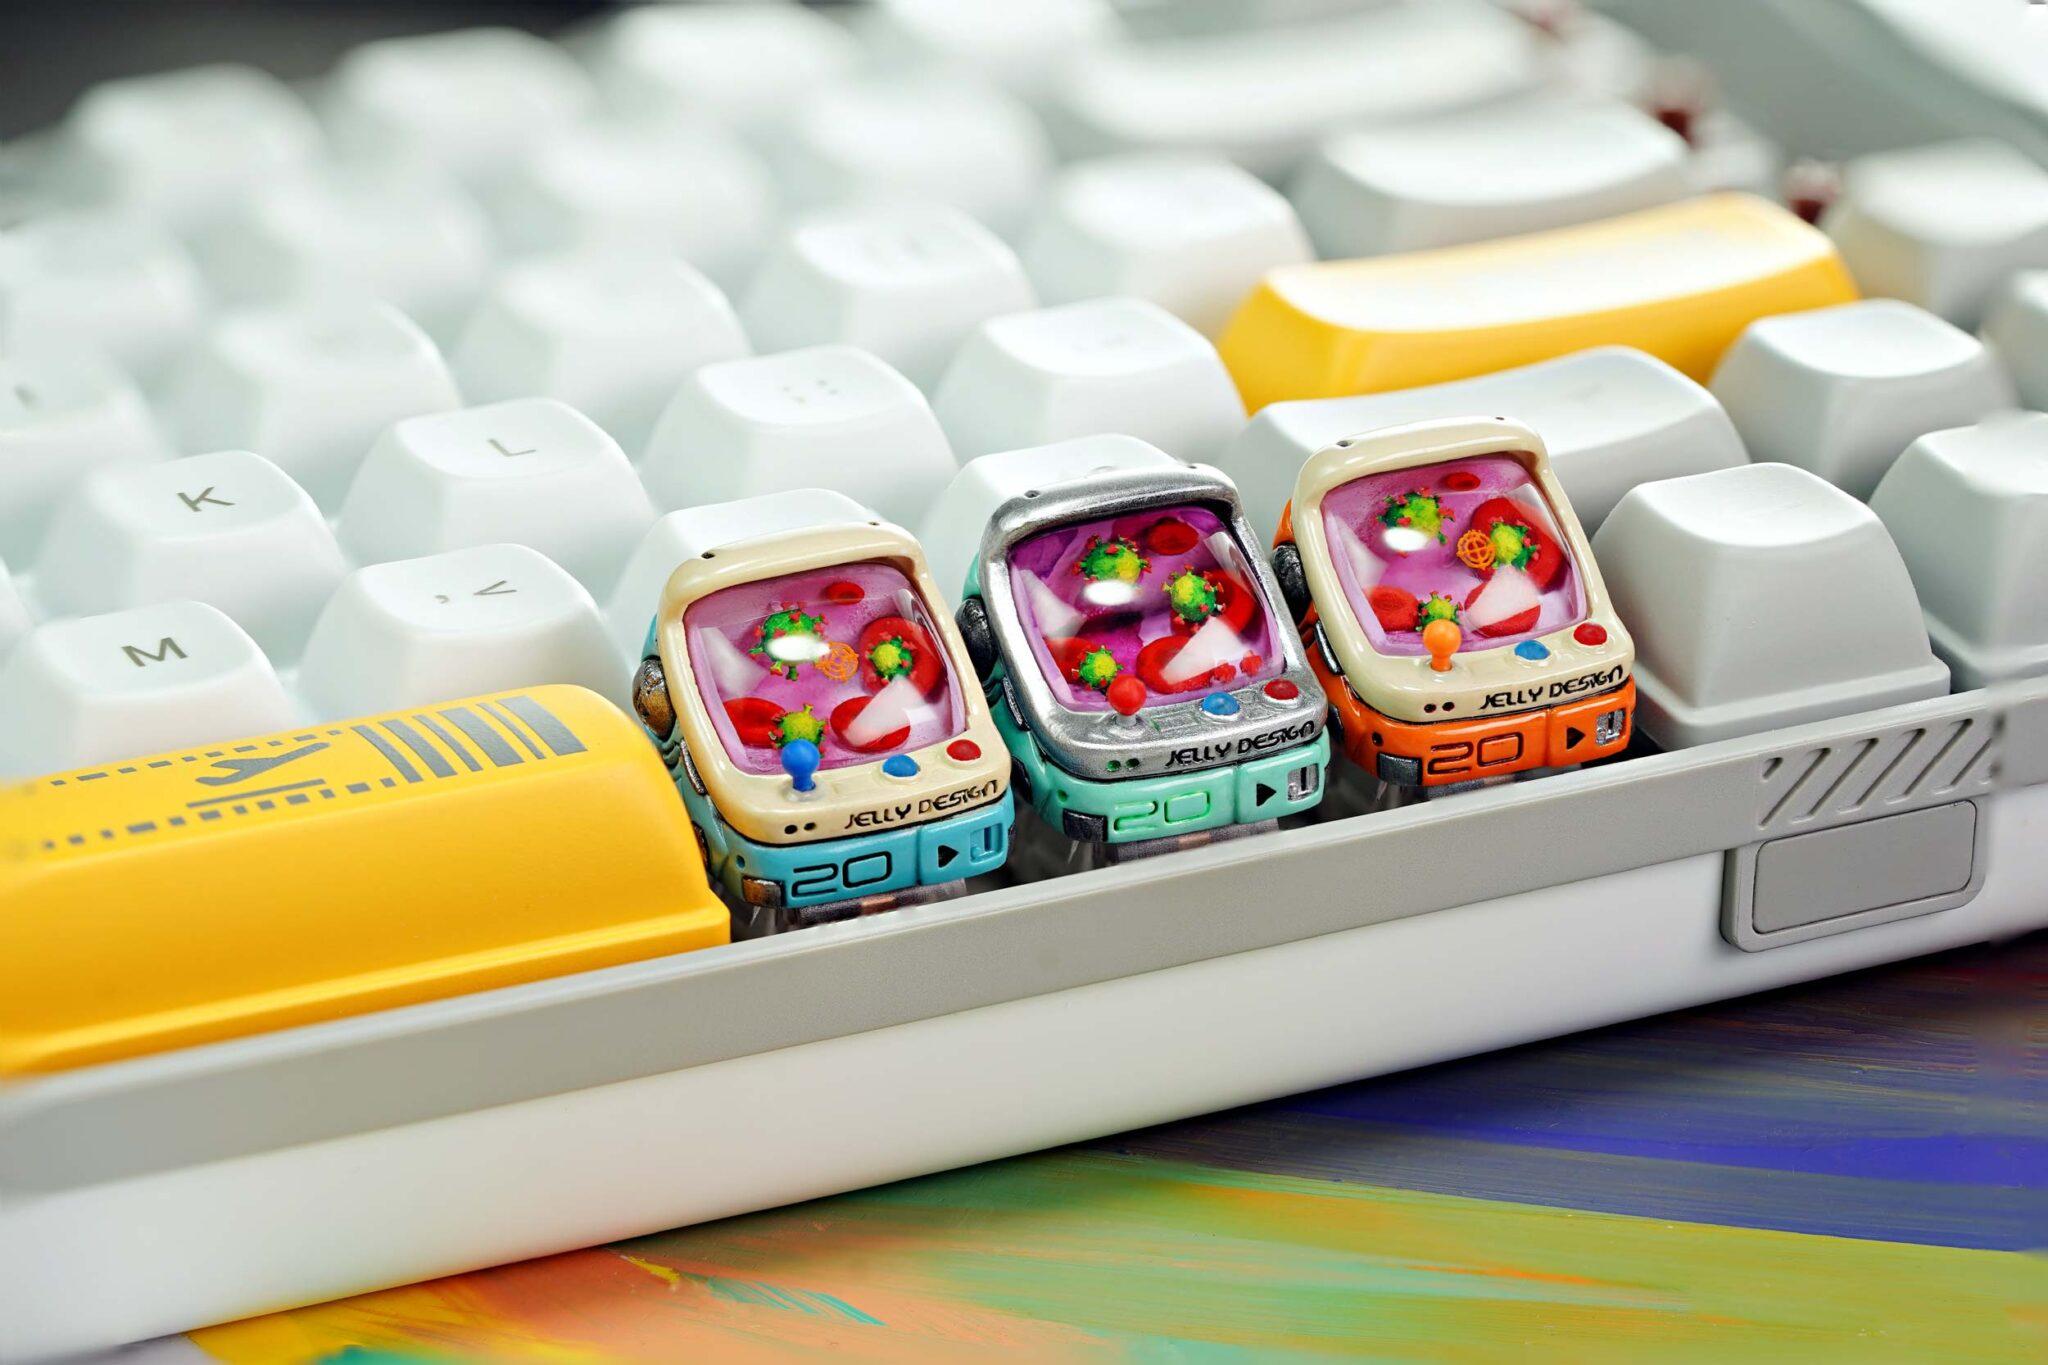 [jelly key][raffle] – arcade cabinets – ageless console keycaps (8)